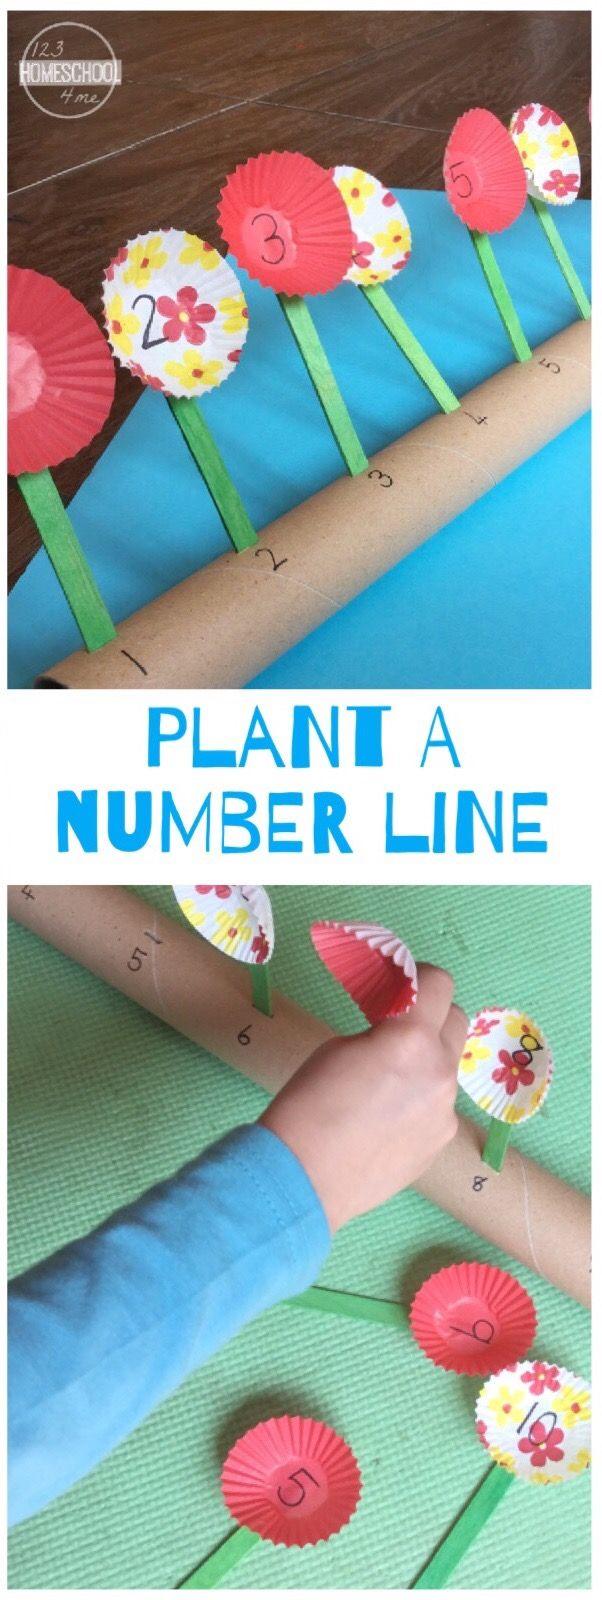 1426 best classroom images on Pinterest | Preschool, Crafts for kids ...